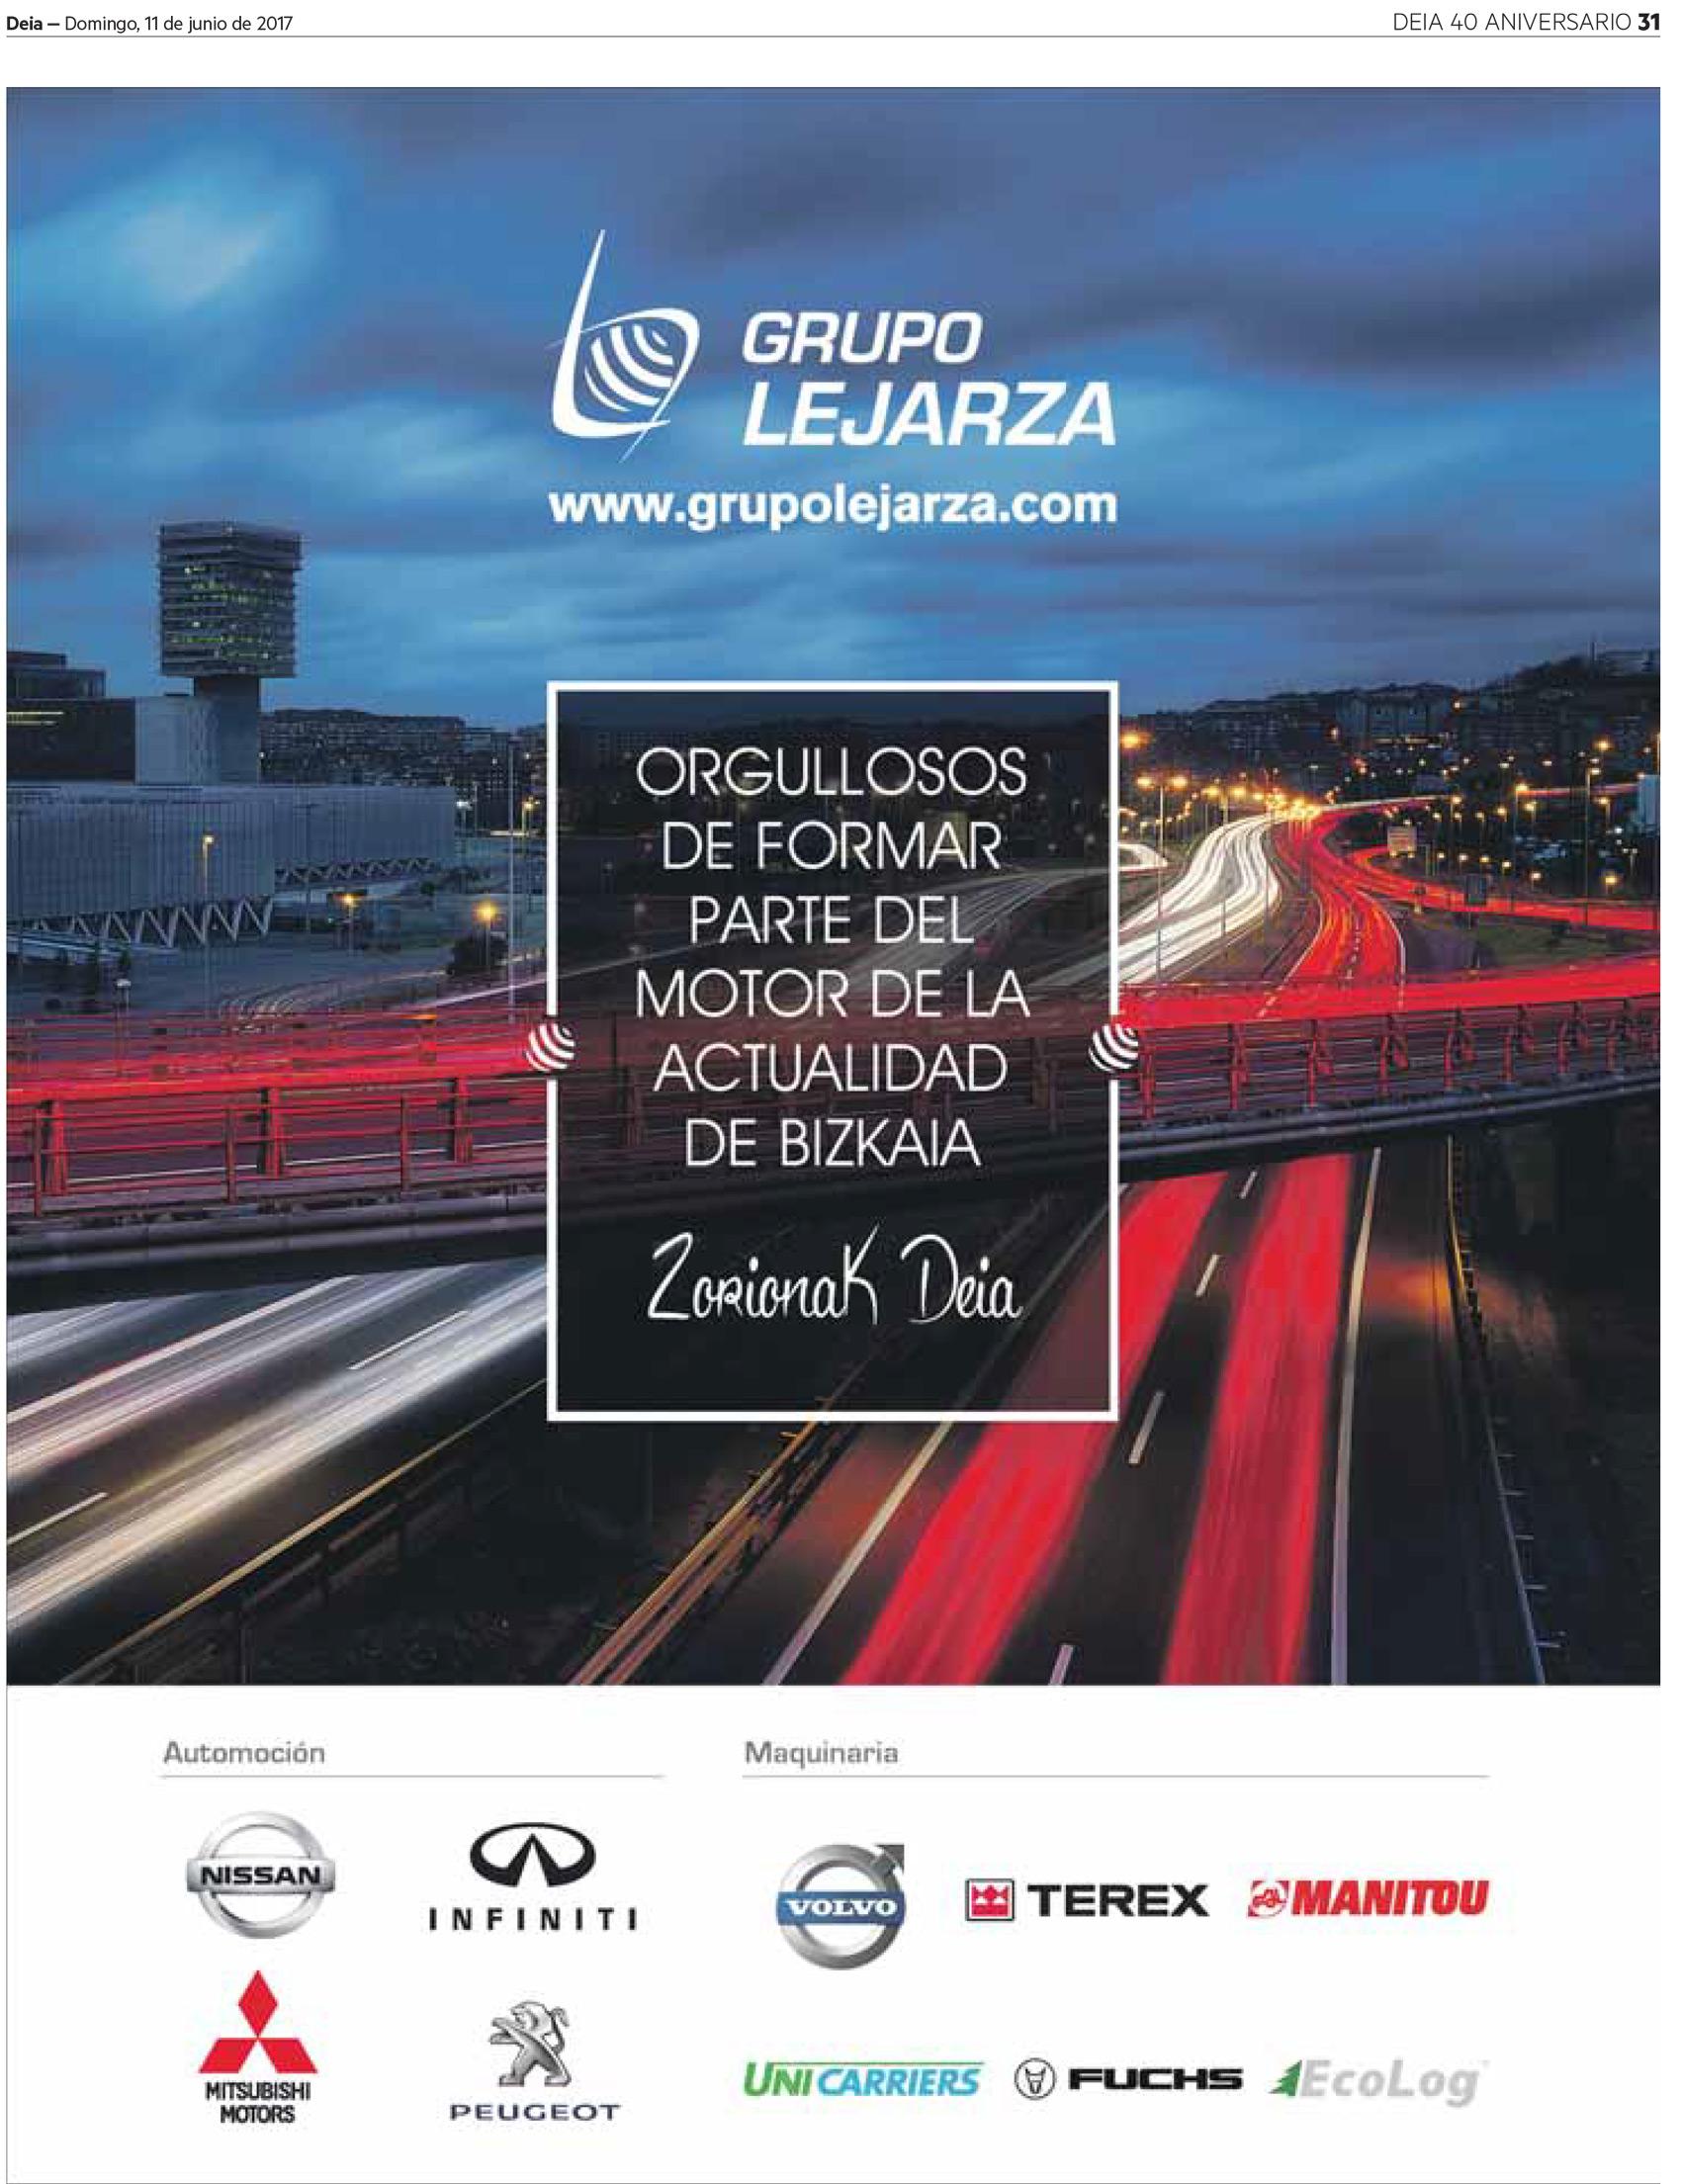 motiva_agencia_comunicacion_diseno-grafico_Deia-40_grupo-lejarza